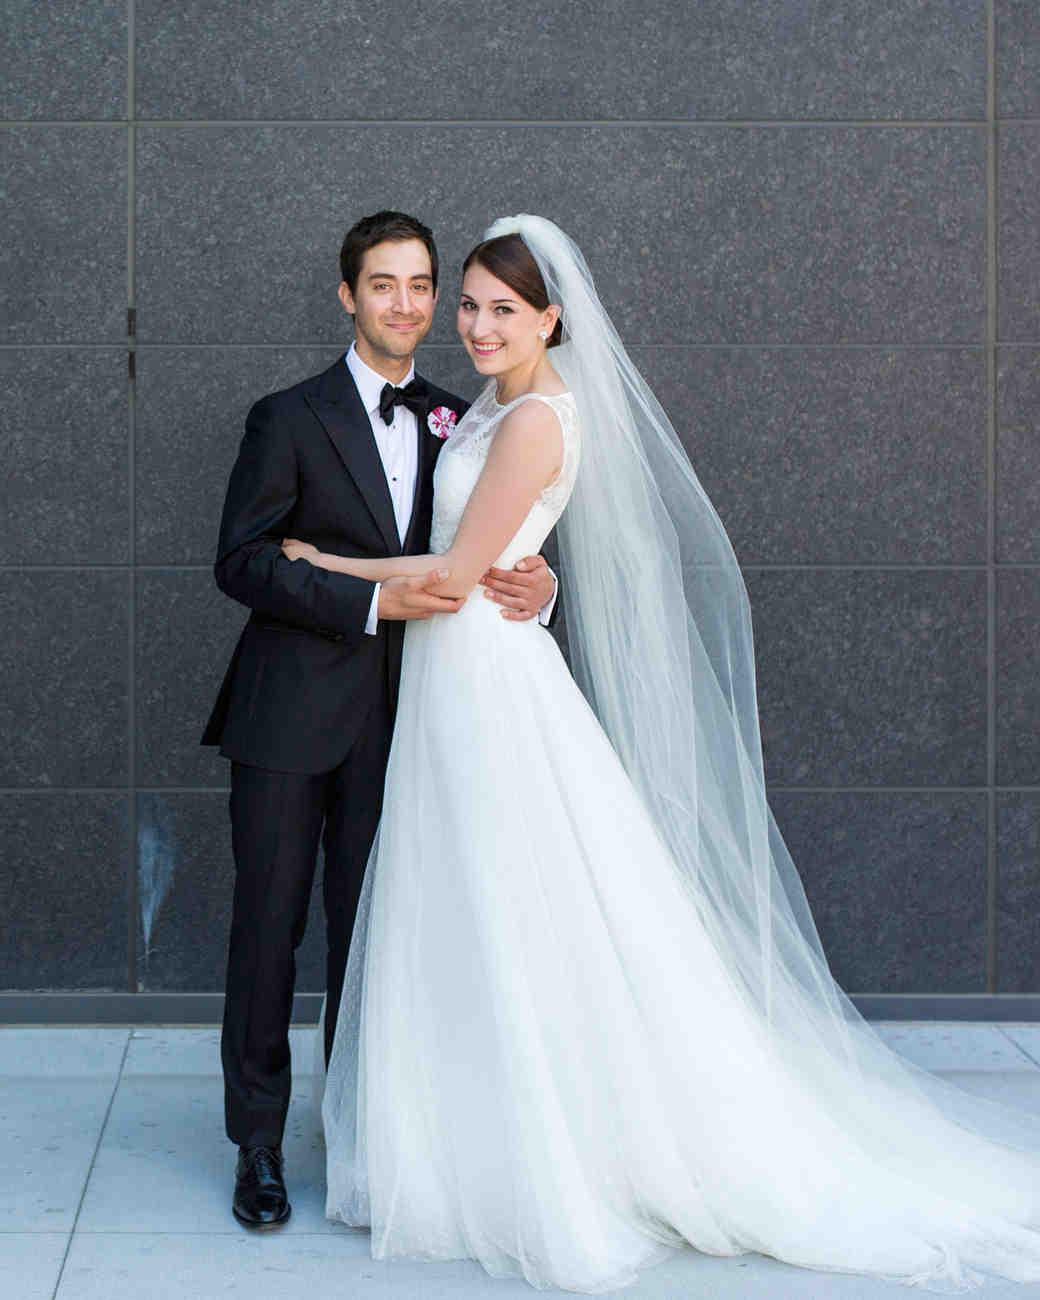 ashley-ryan-wedding-couple-10990-s111852-0415.jpg